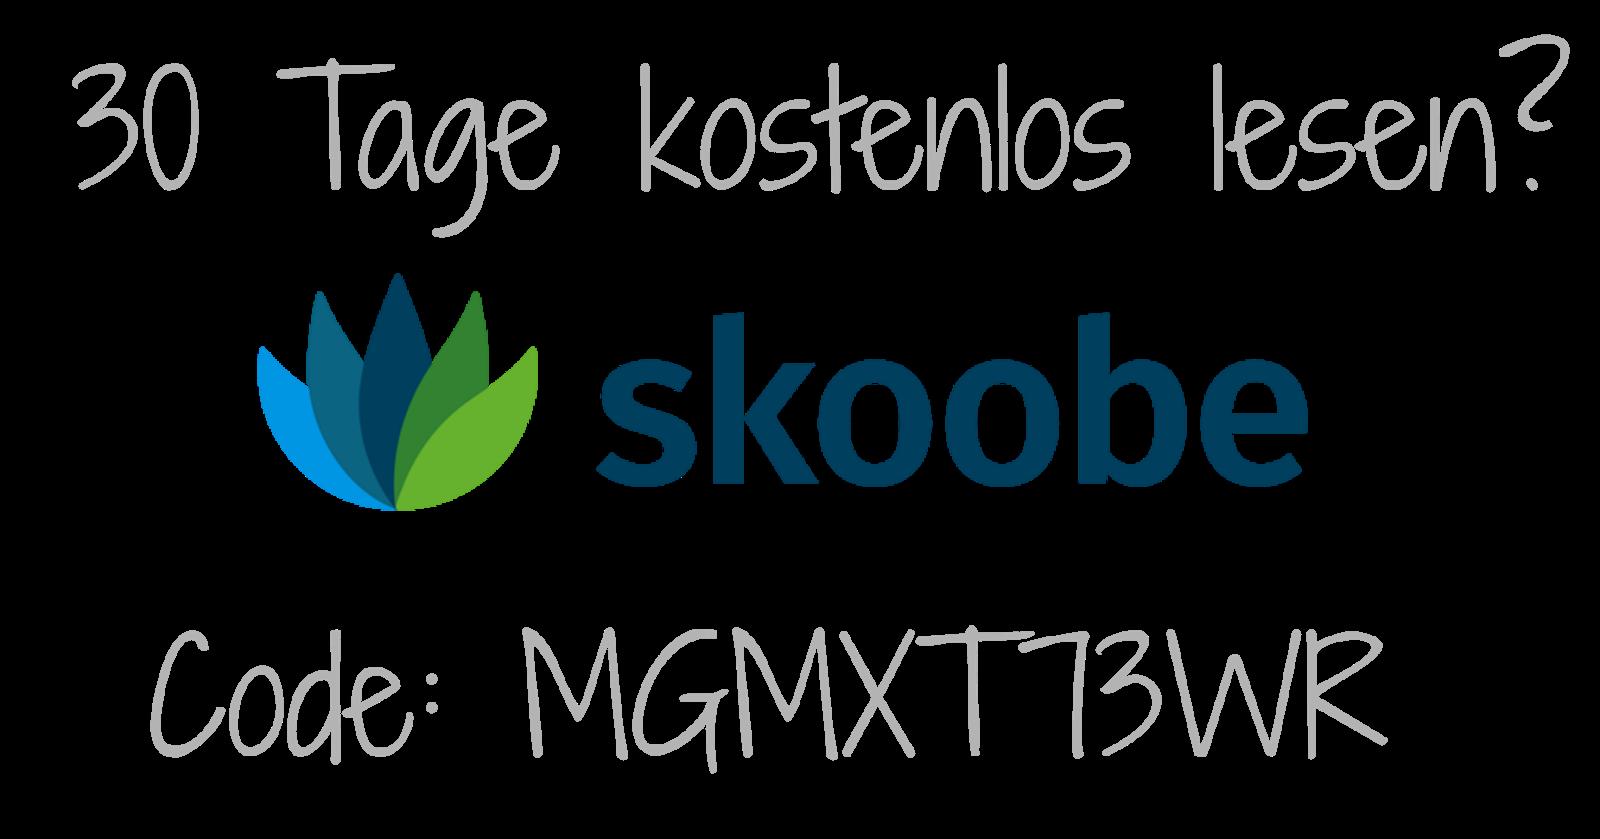 https://www.skoobe.de/redeem-code?code=MGMXT73WR